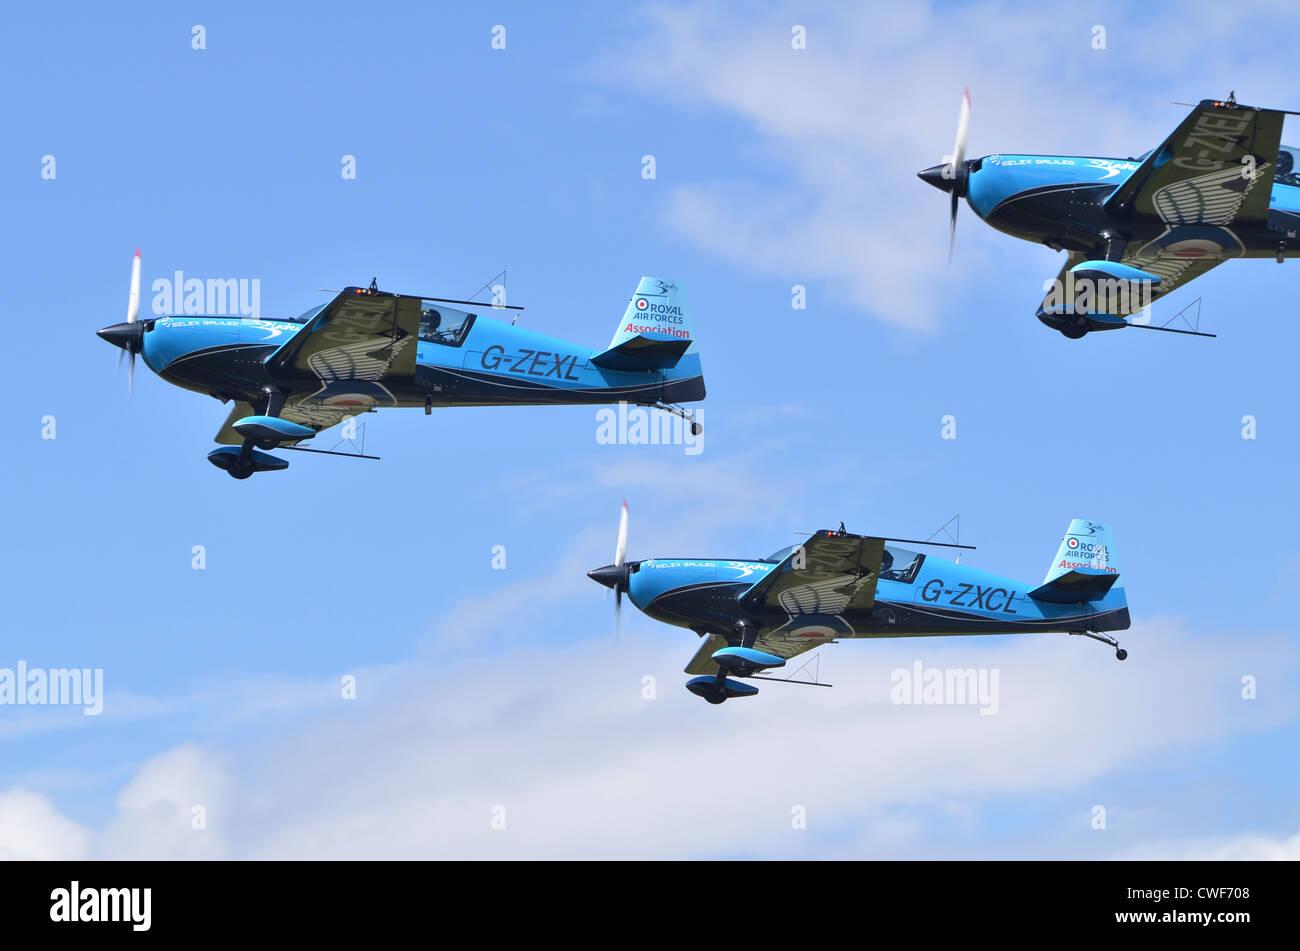 The Blades Aerobatic Display Team, Royal Air Forces Association, taking off at Farnborough International Airshow Stock Photo